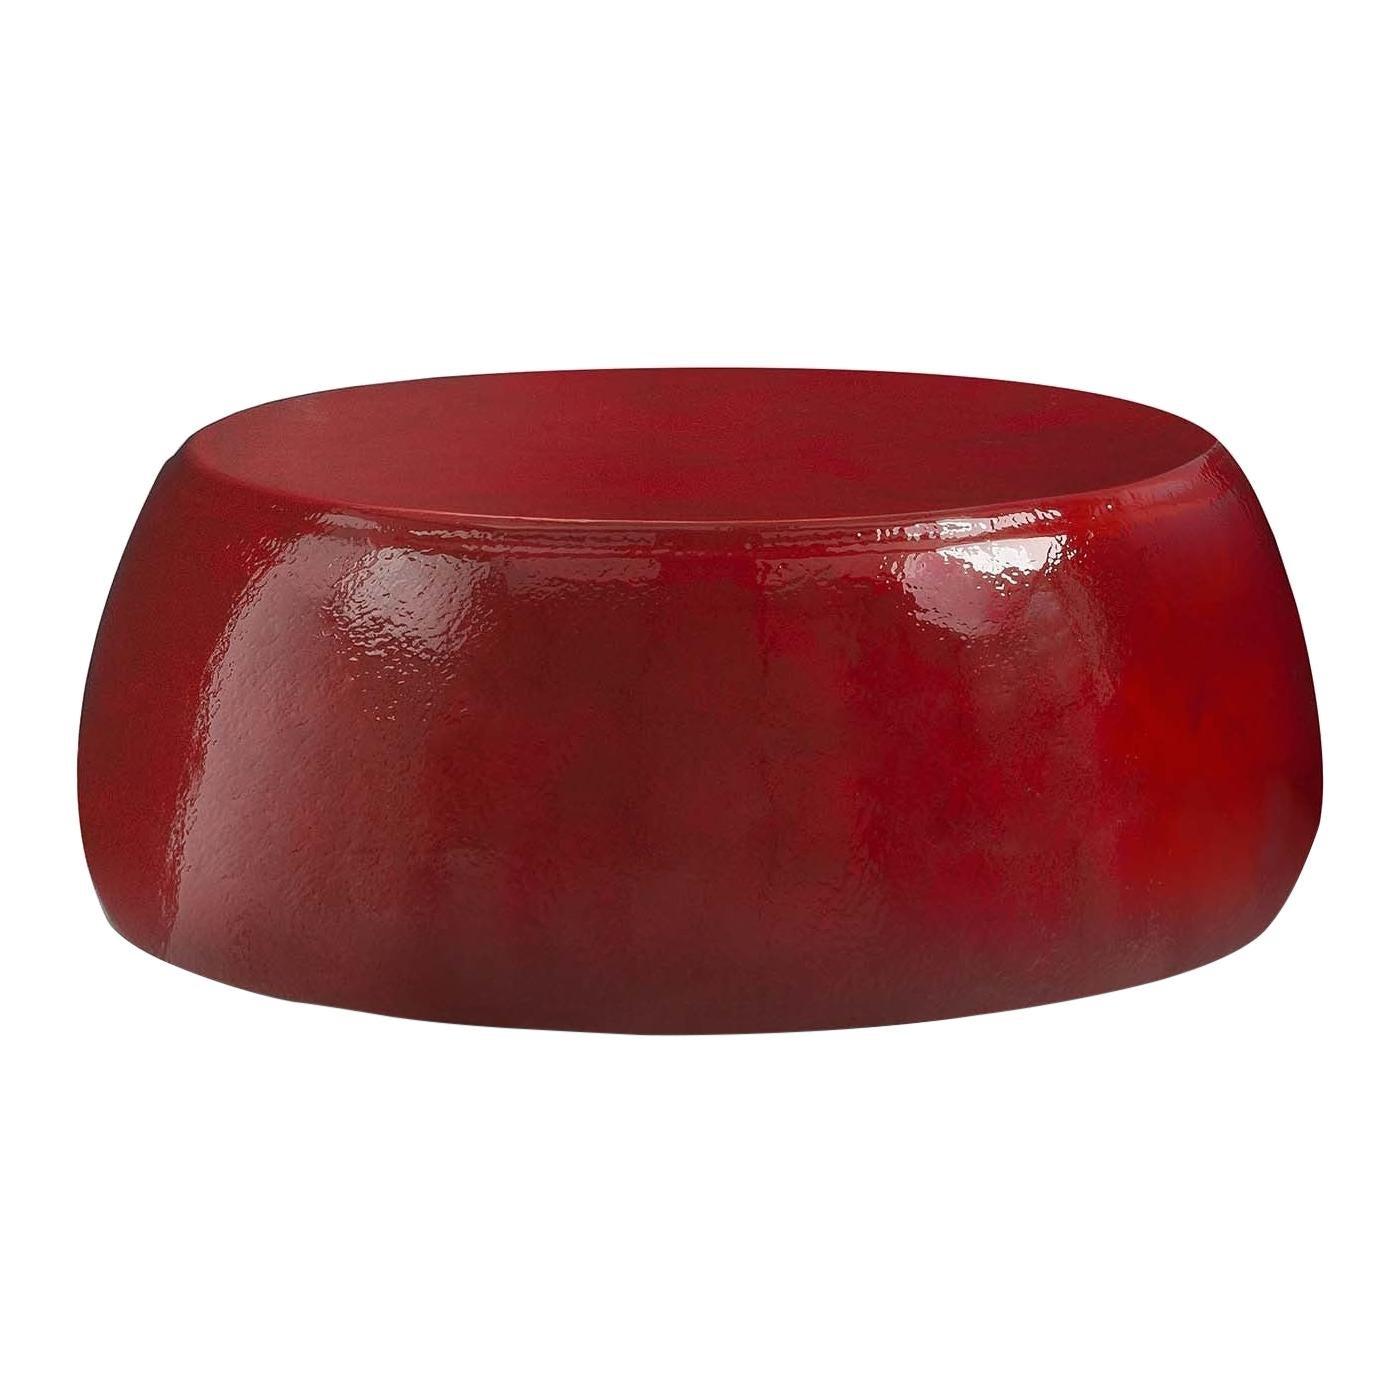 Incontro Large Cherry Pouf